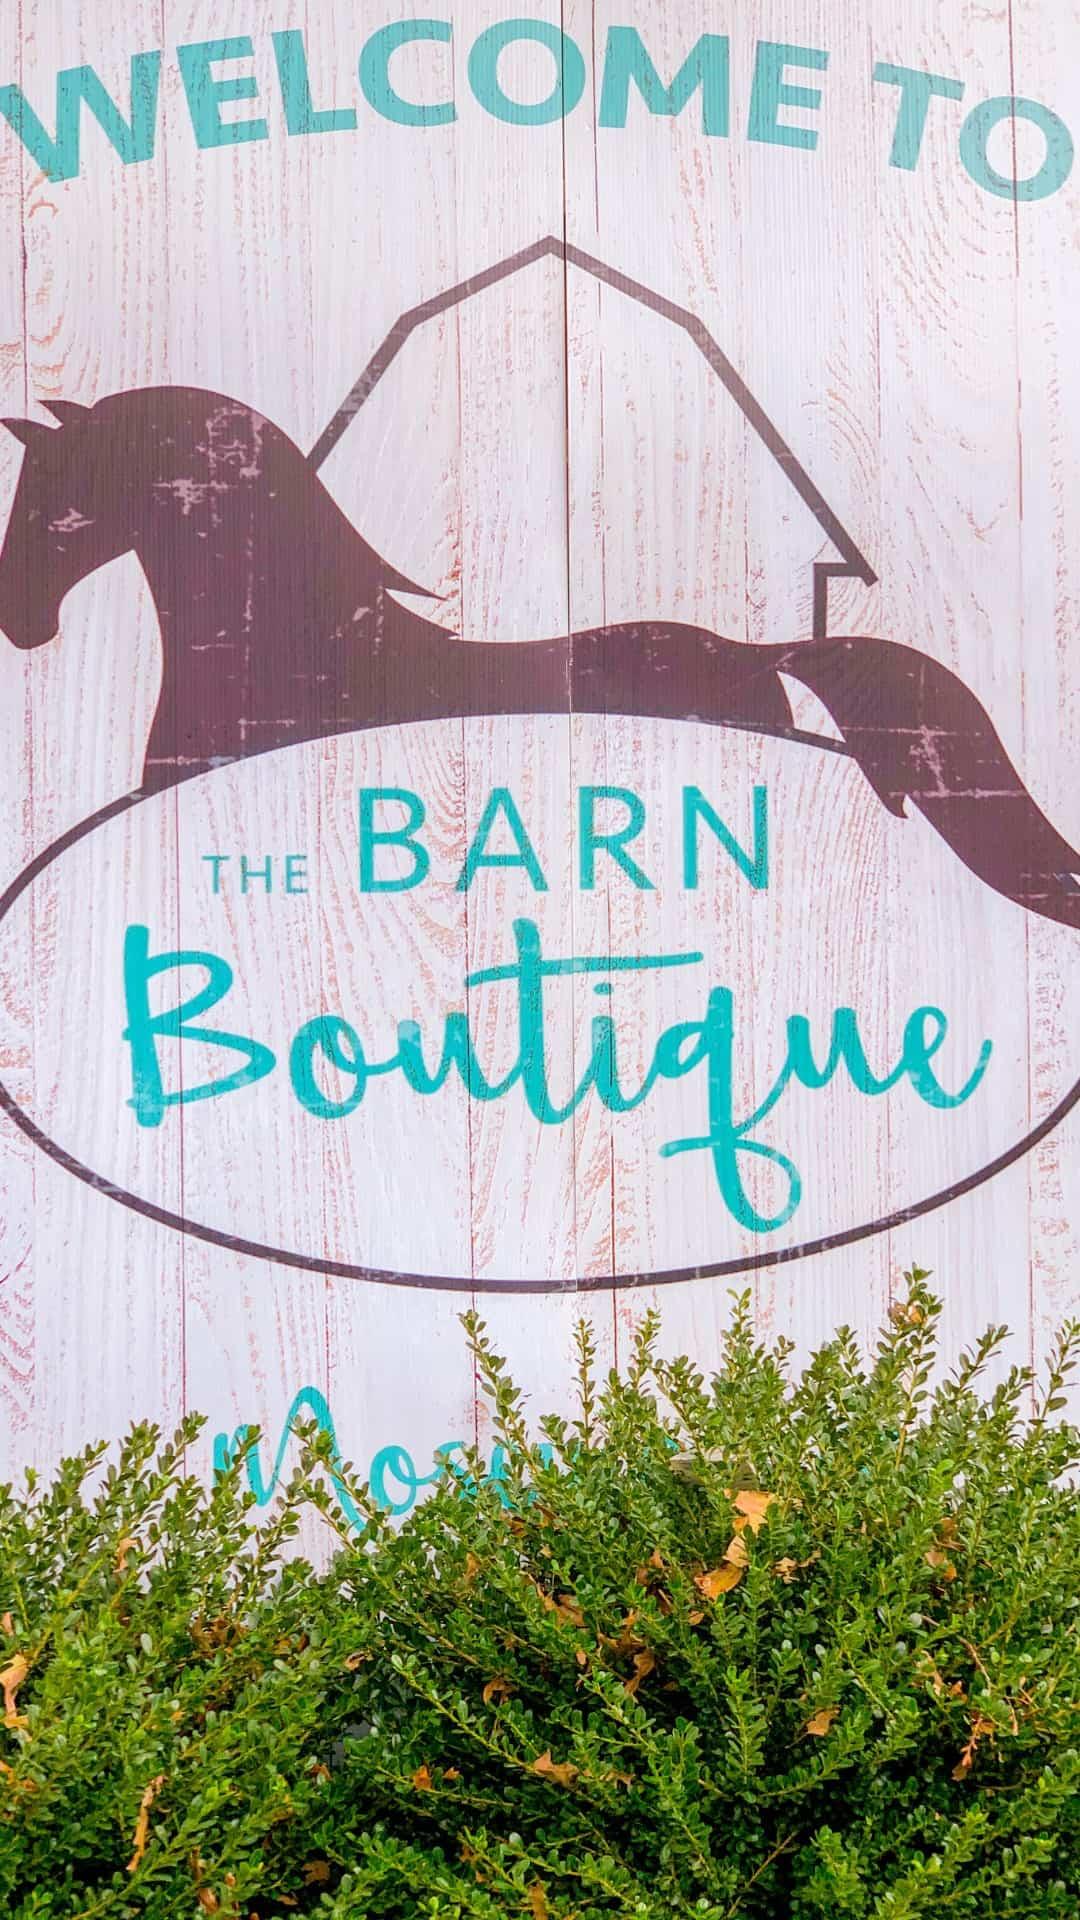 Autumn Wallpaper iPhone Aesthetic Barn Boutique